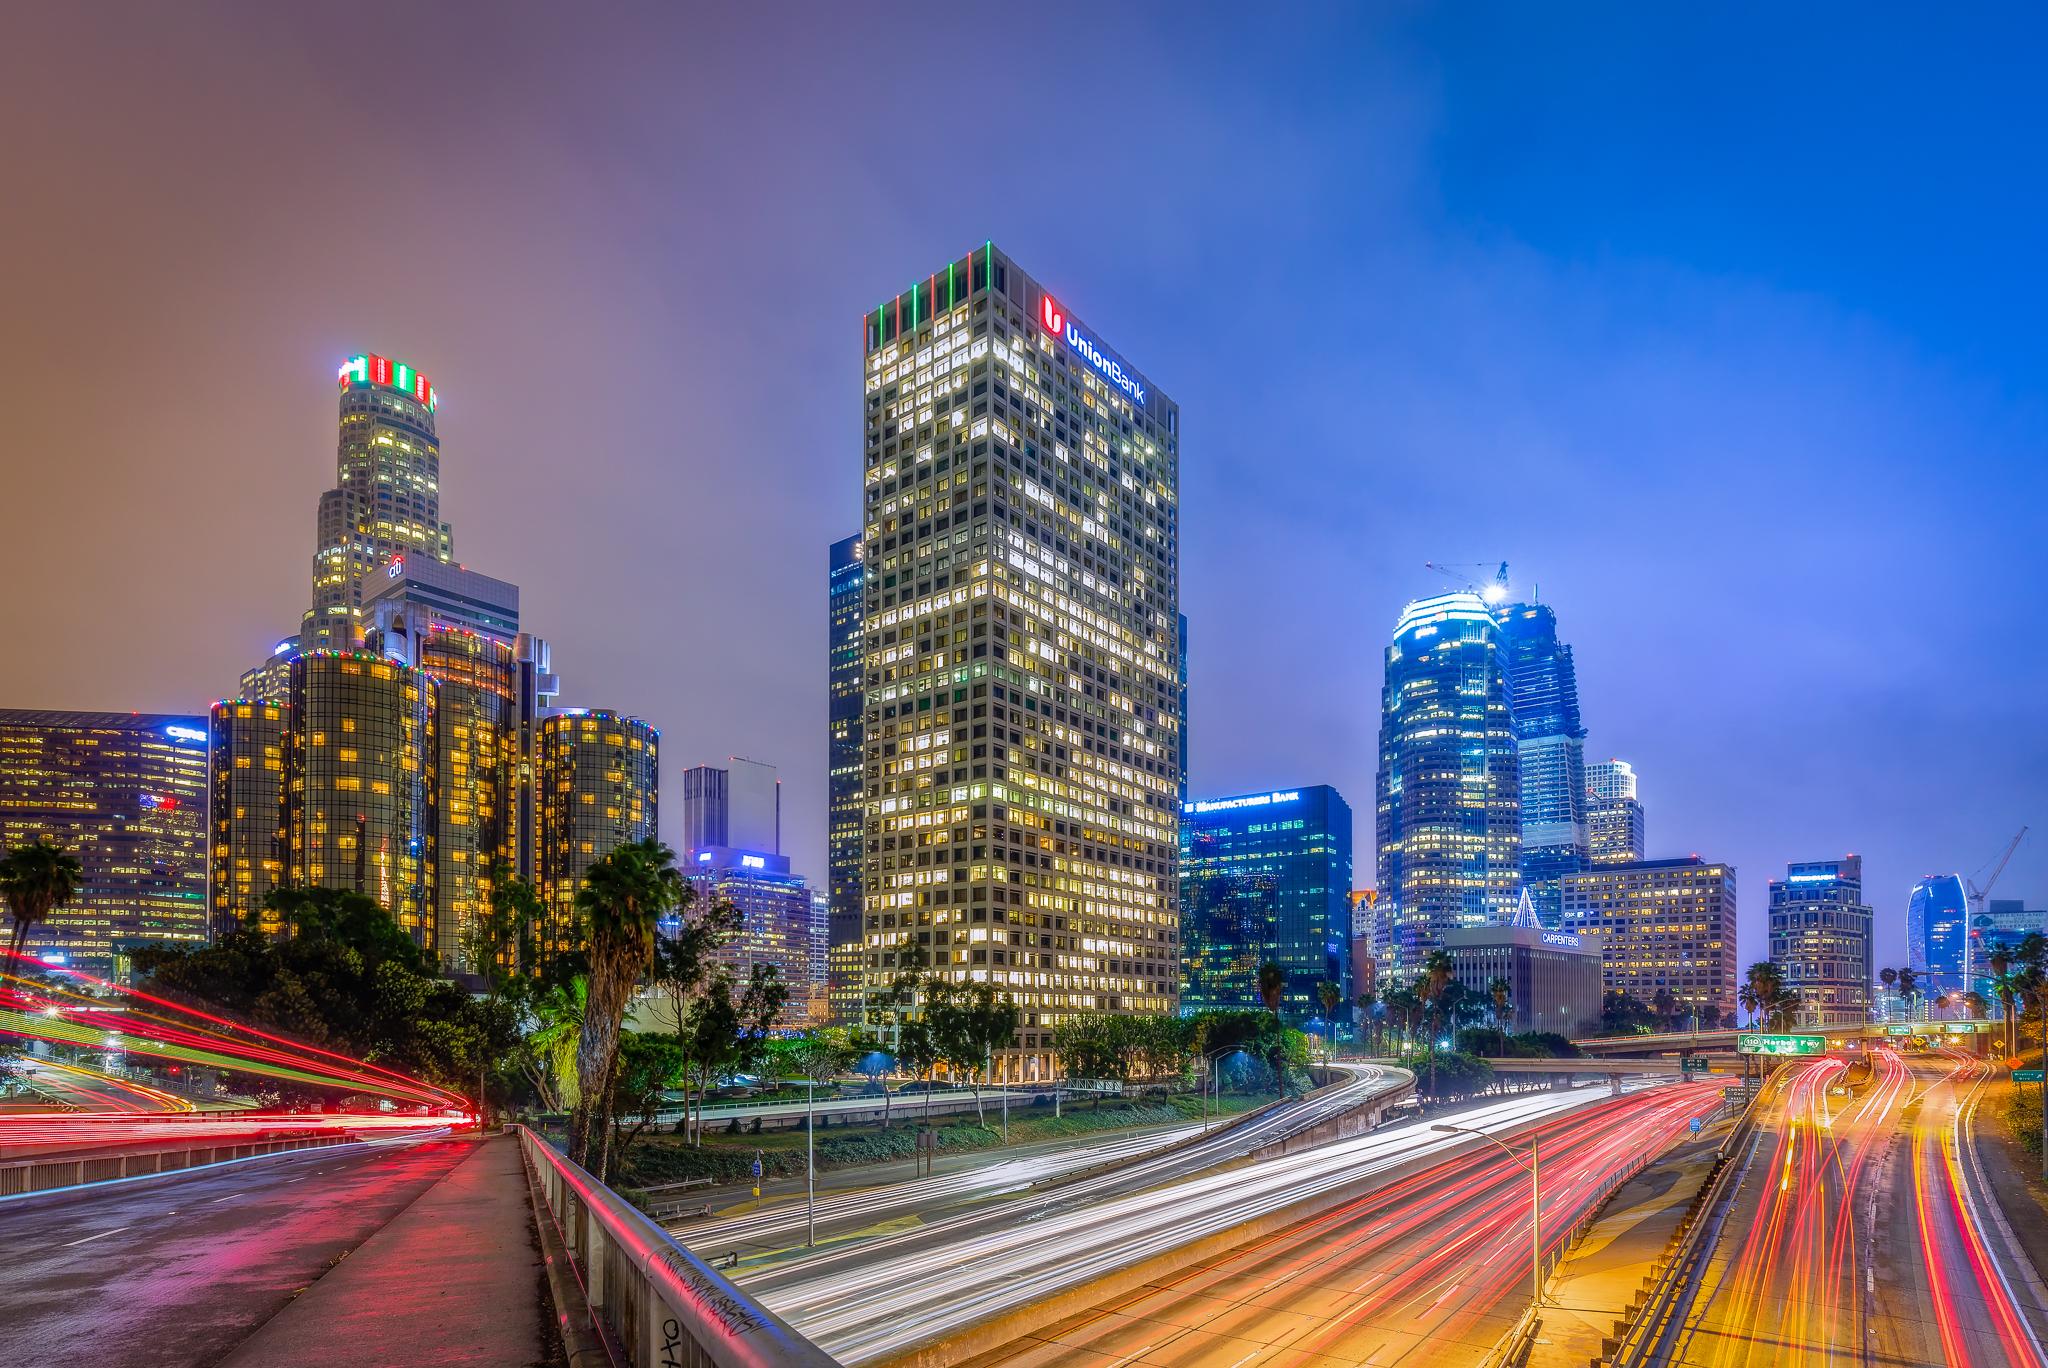 Los Angeles Skyline on a misty night.